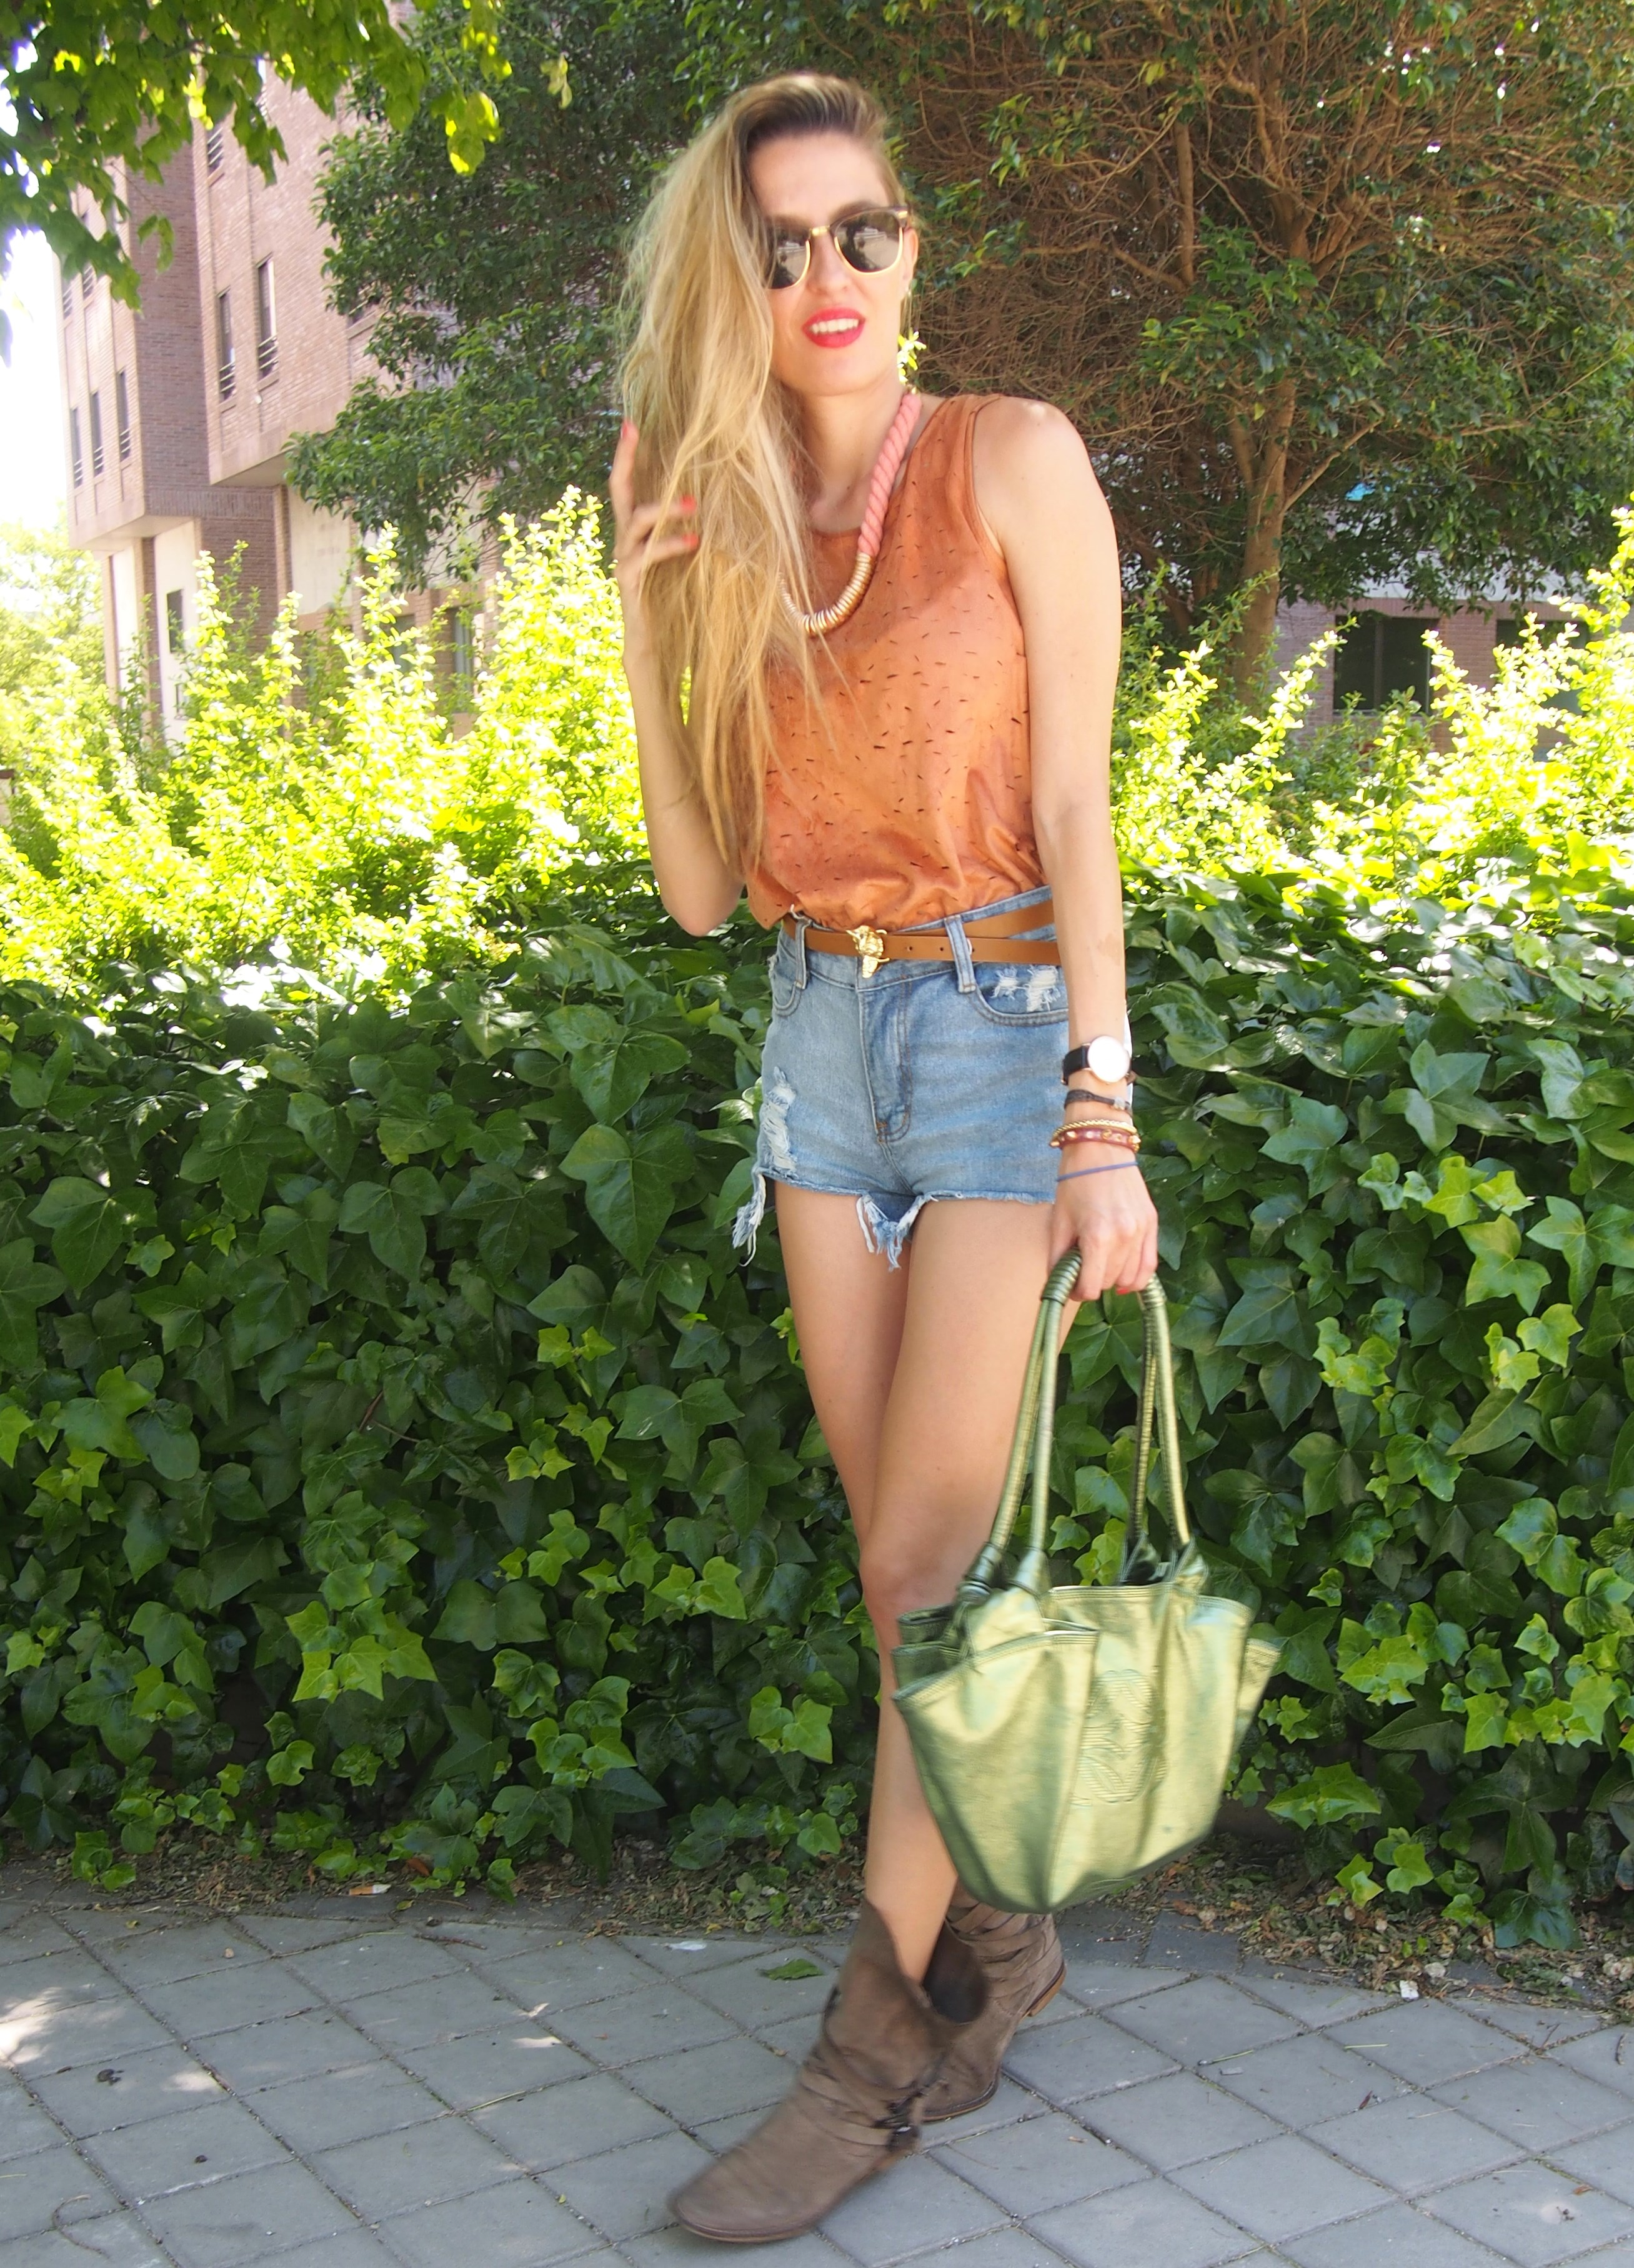 Shorts_Top_Boots_Aire_Loewe_Lara_Martin_Gilarranz_Bymyheels